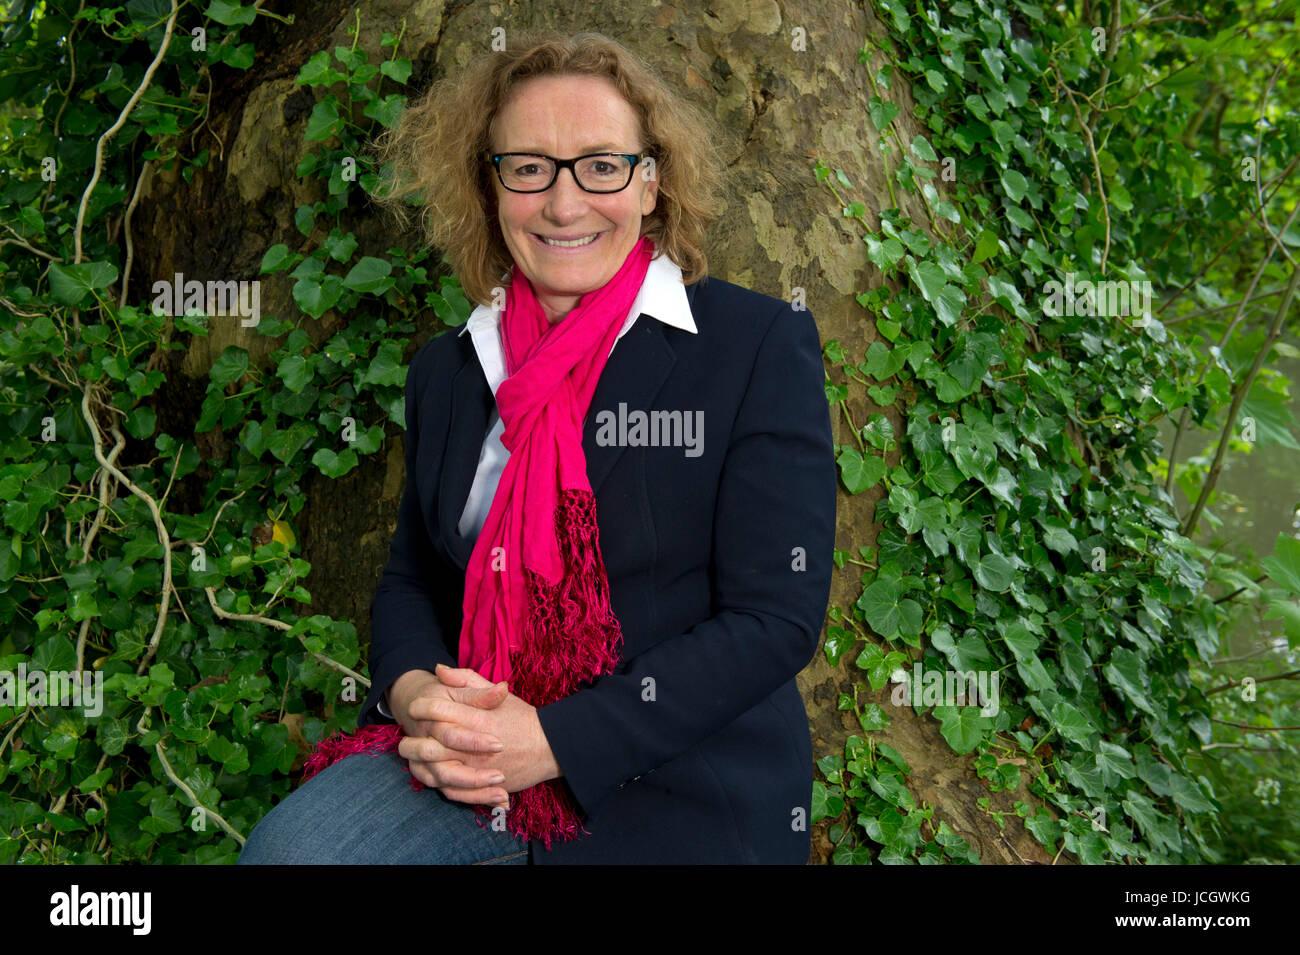 Juliet Davenport, CEO of Good Energy, a green energy supplier in Chippenham, Wiltshire, UK. Stock Photo